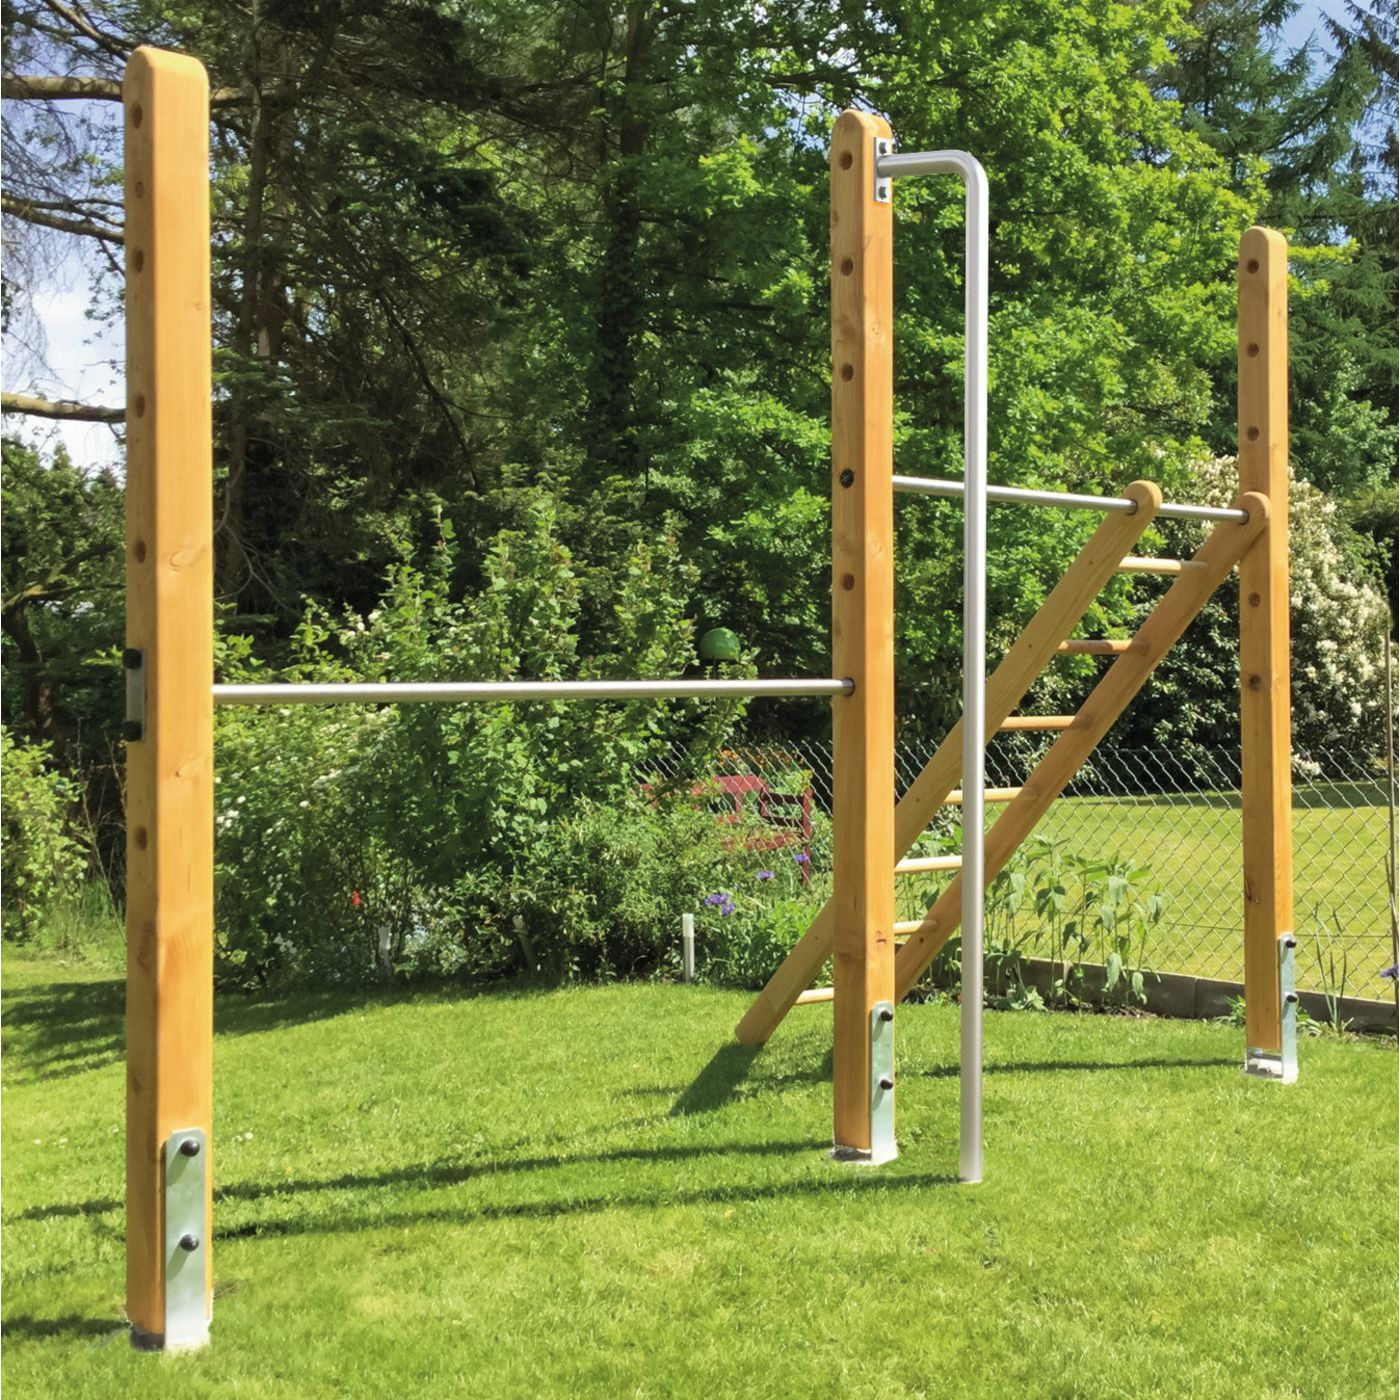 Feuerwehr Stange Online Bestellen Jako O Kinder Garten Gartentipps Garten